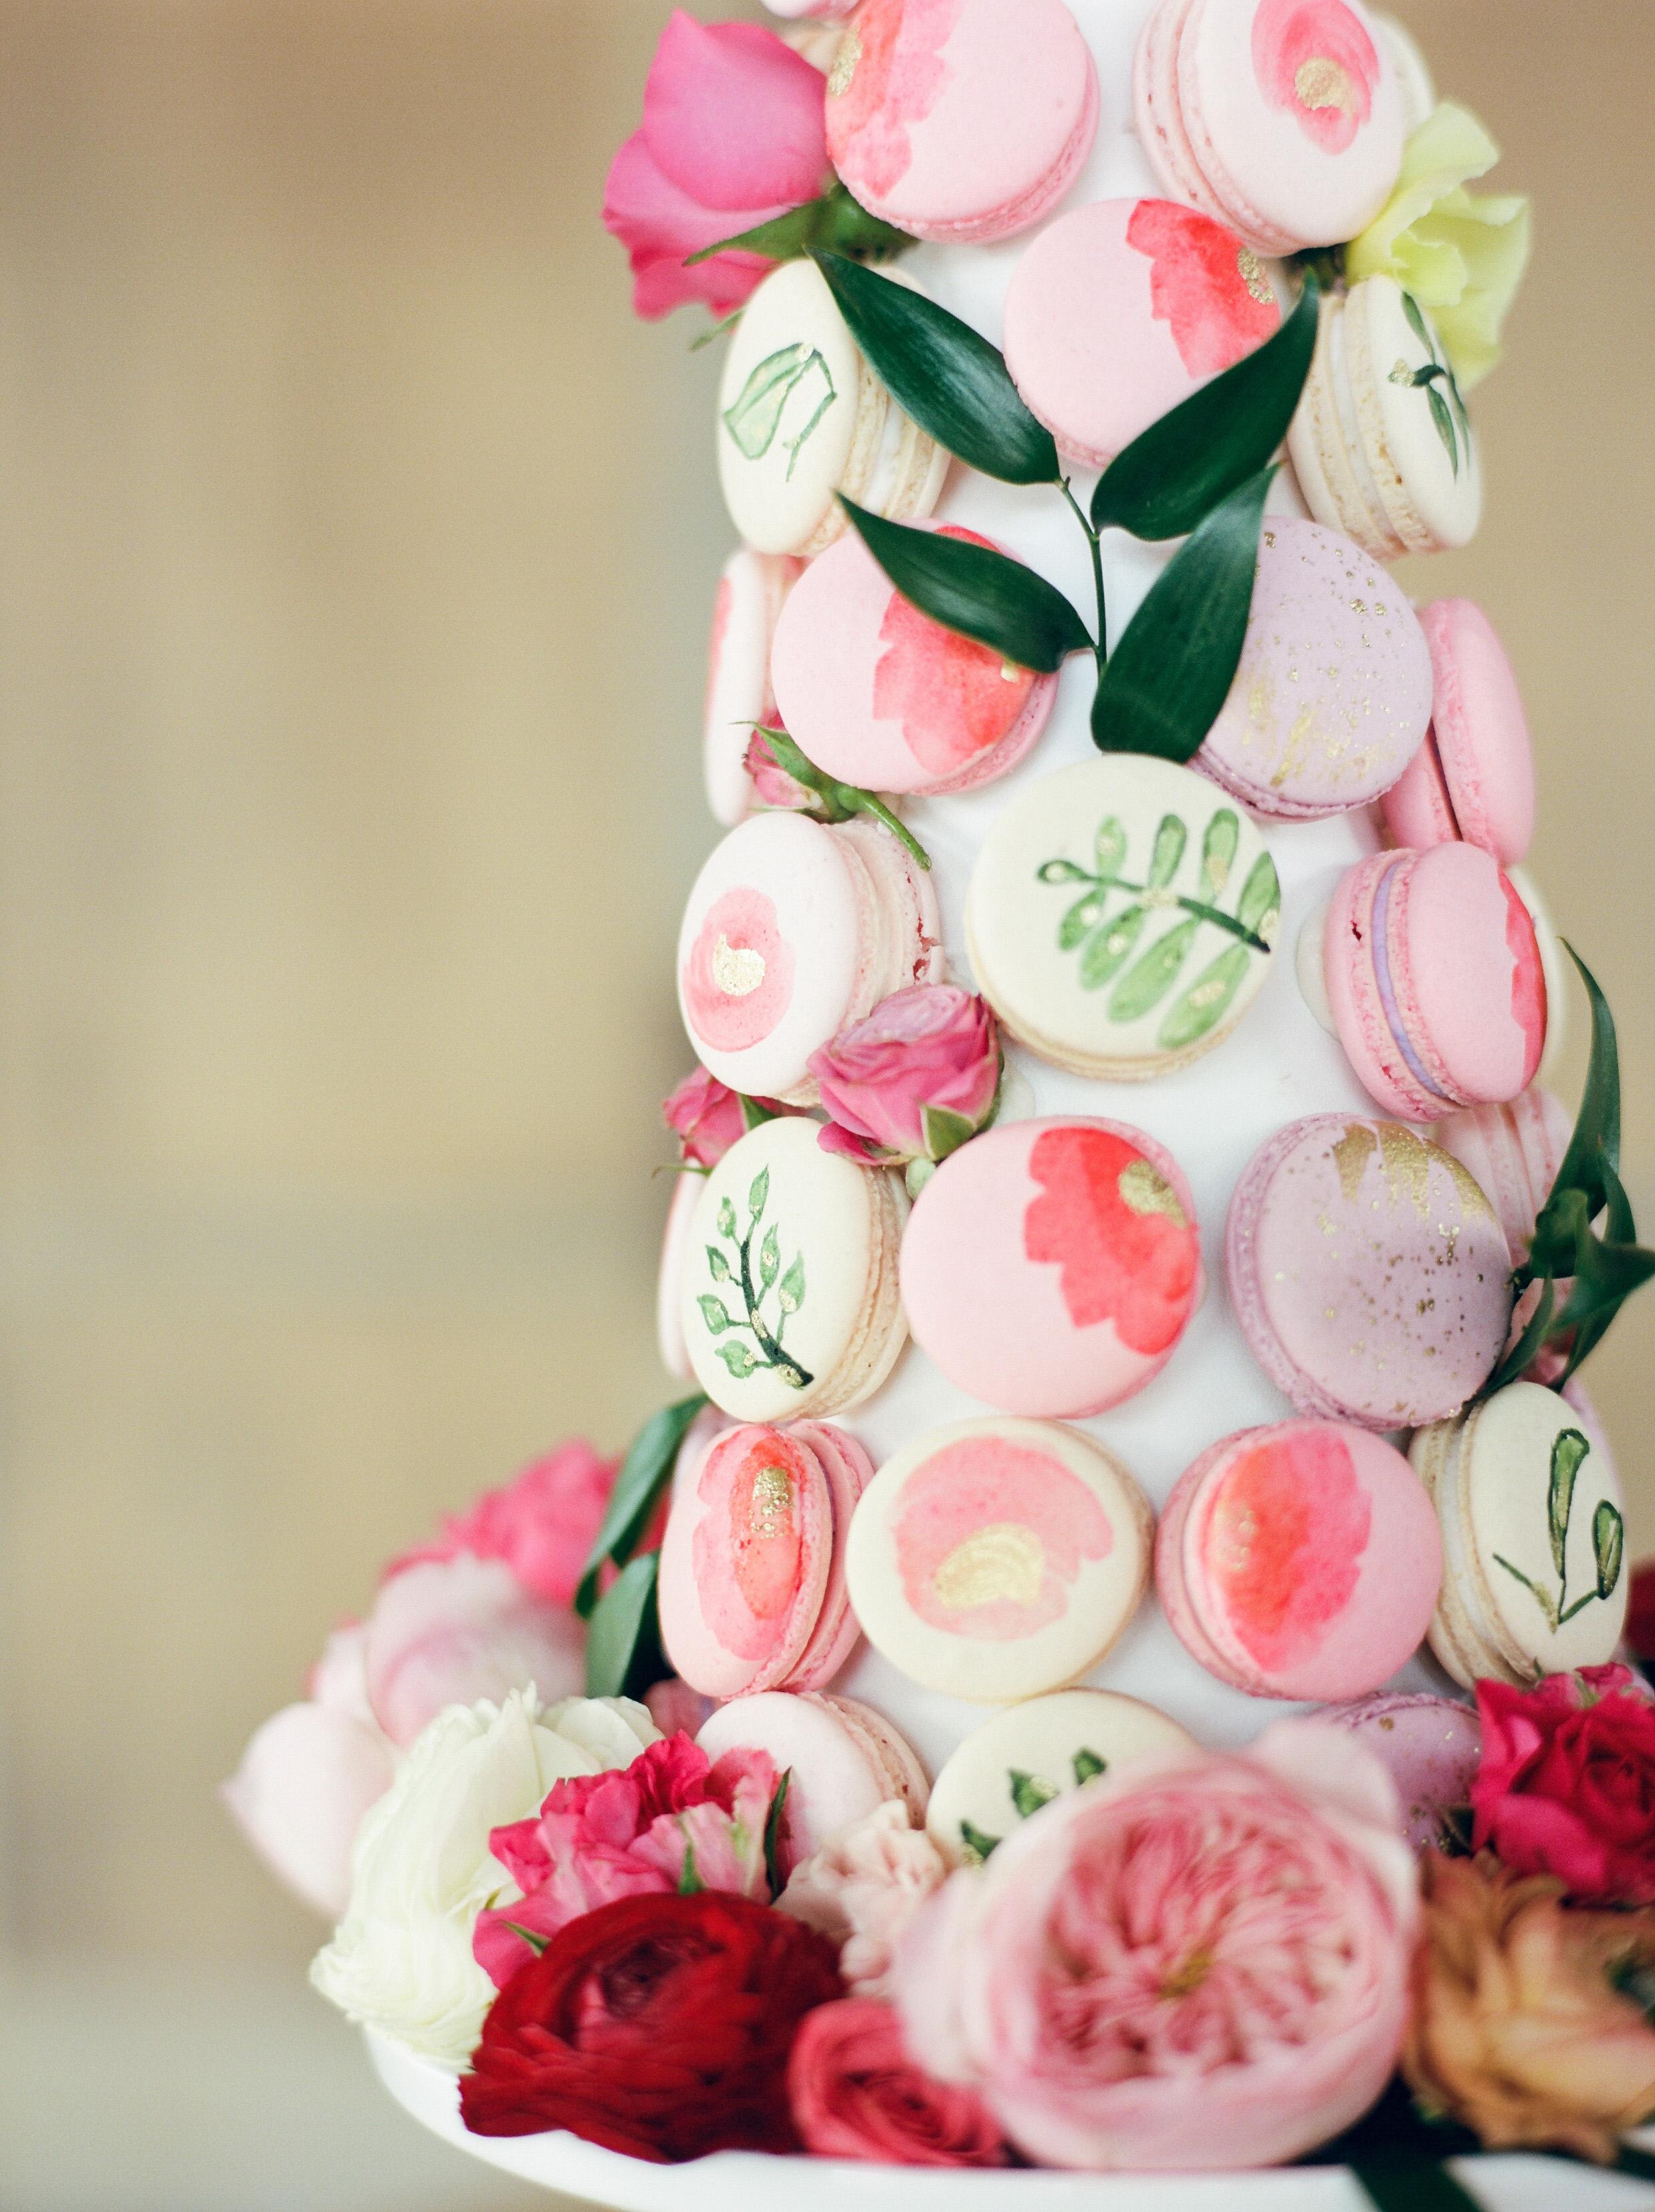 The-Knot-50-Weddings-50-States-Texas-Winner-Dana-Fernandez-photography-houston-wedding-photographer-film-fine-art-destination-39.jpg